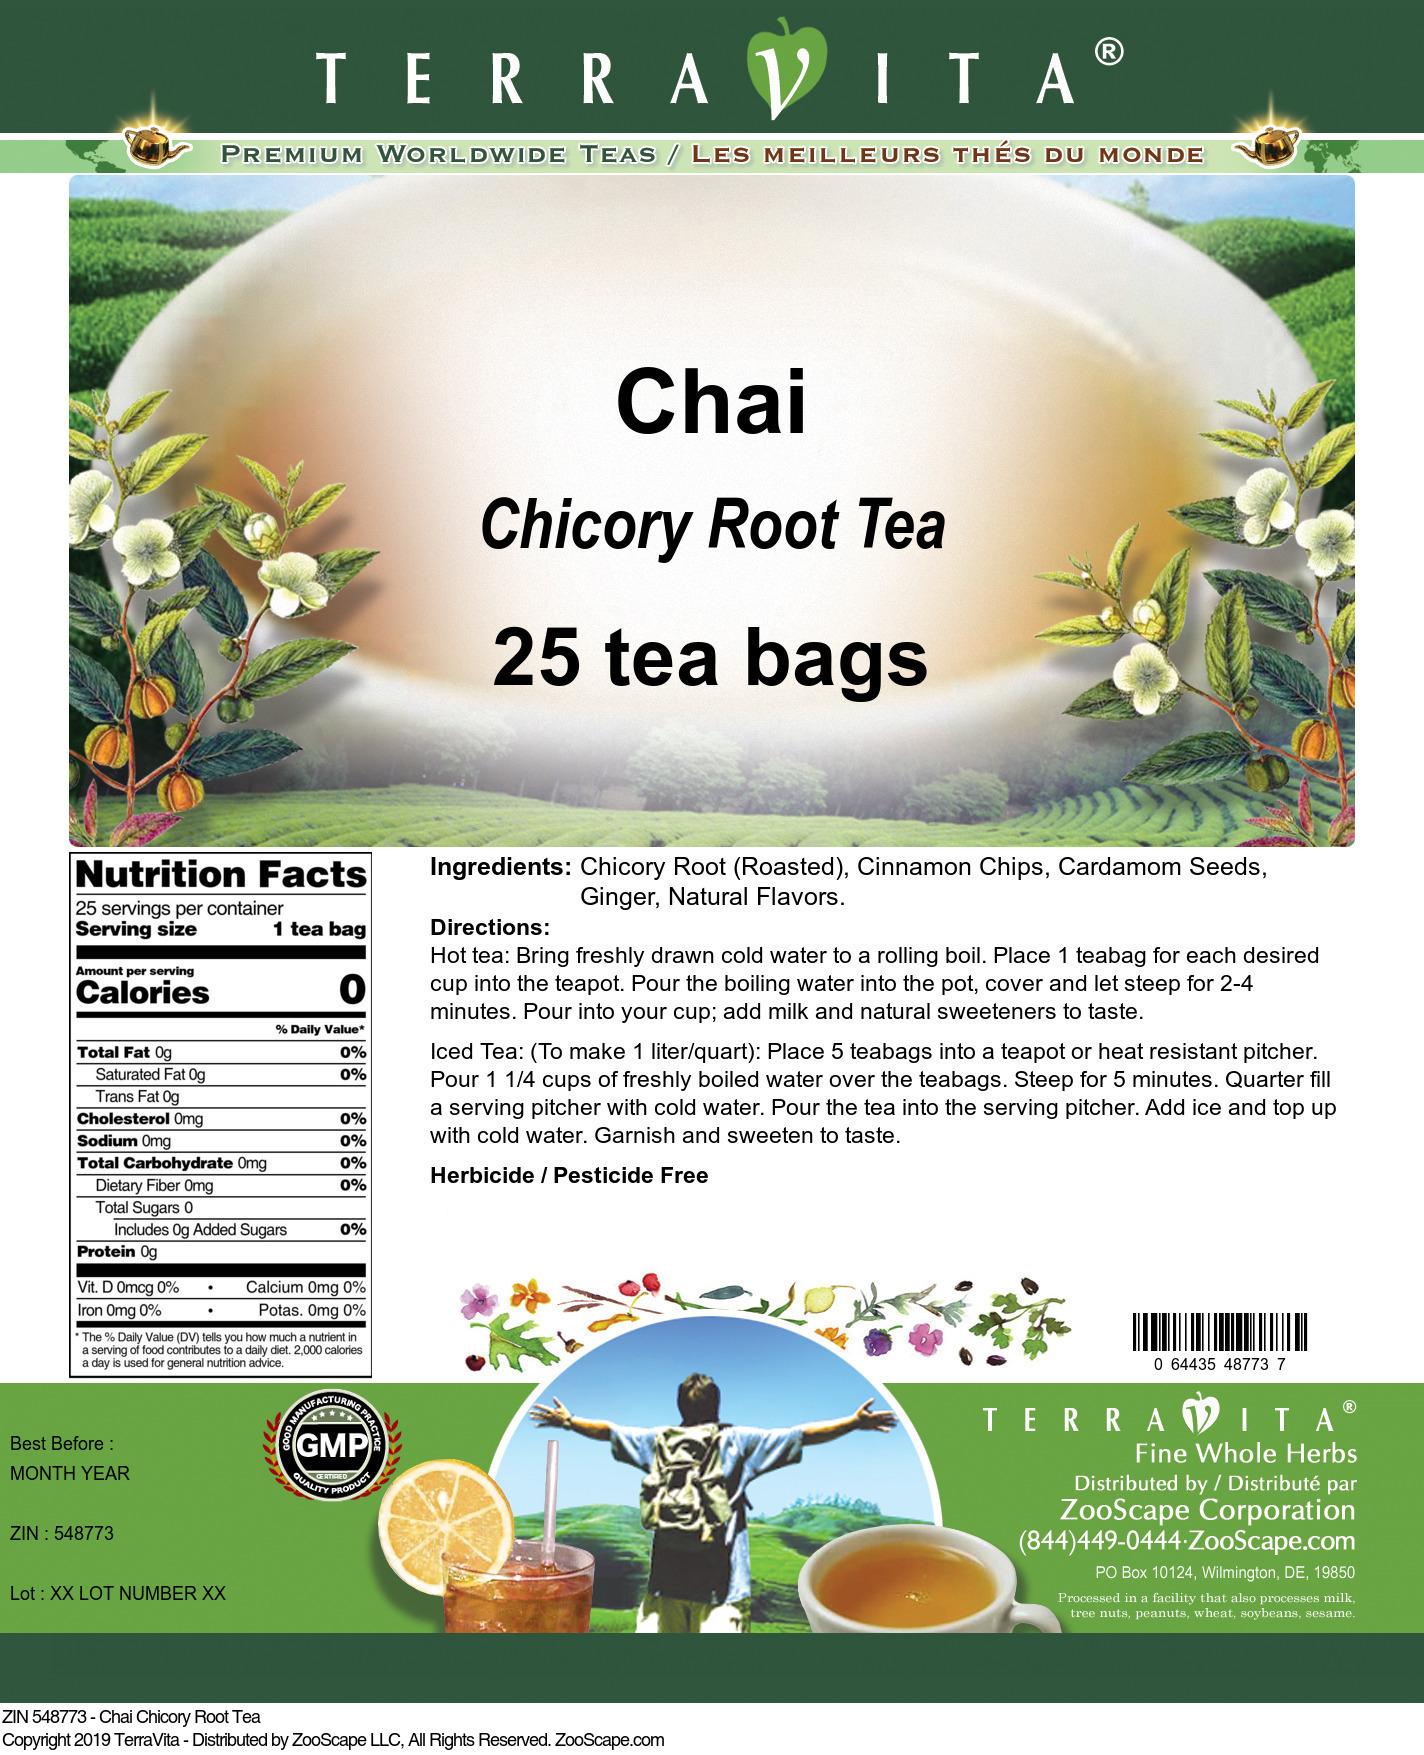 Chai Chicory Root Tea